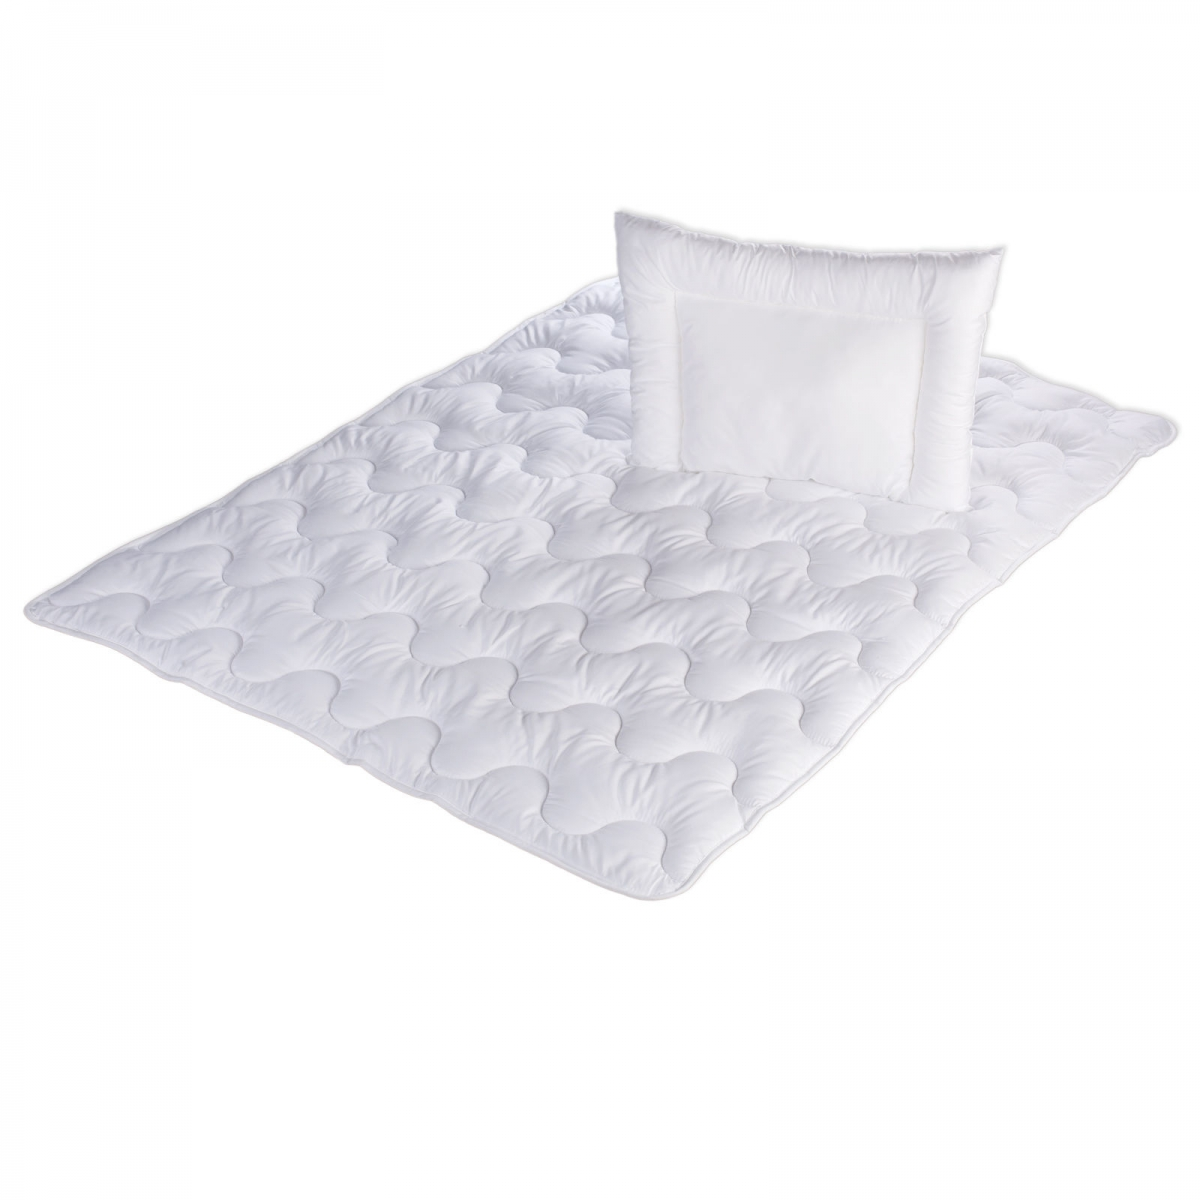 microfaser kinderbetten set 100x135cm bettchen 40. Black Bedroom Furniture Sets. Home Design Ideas